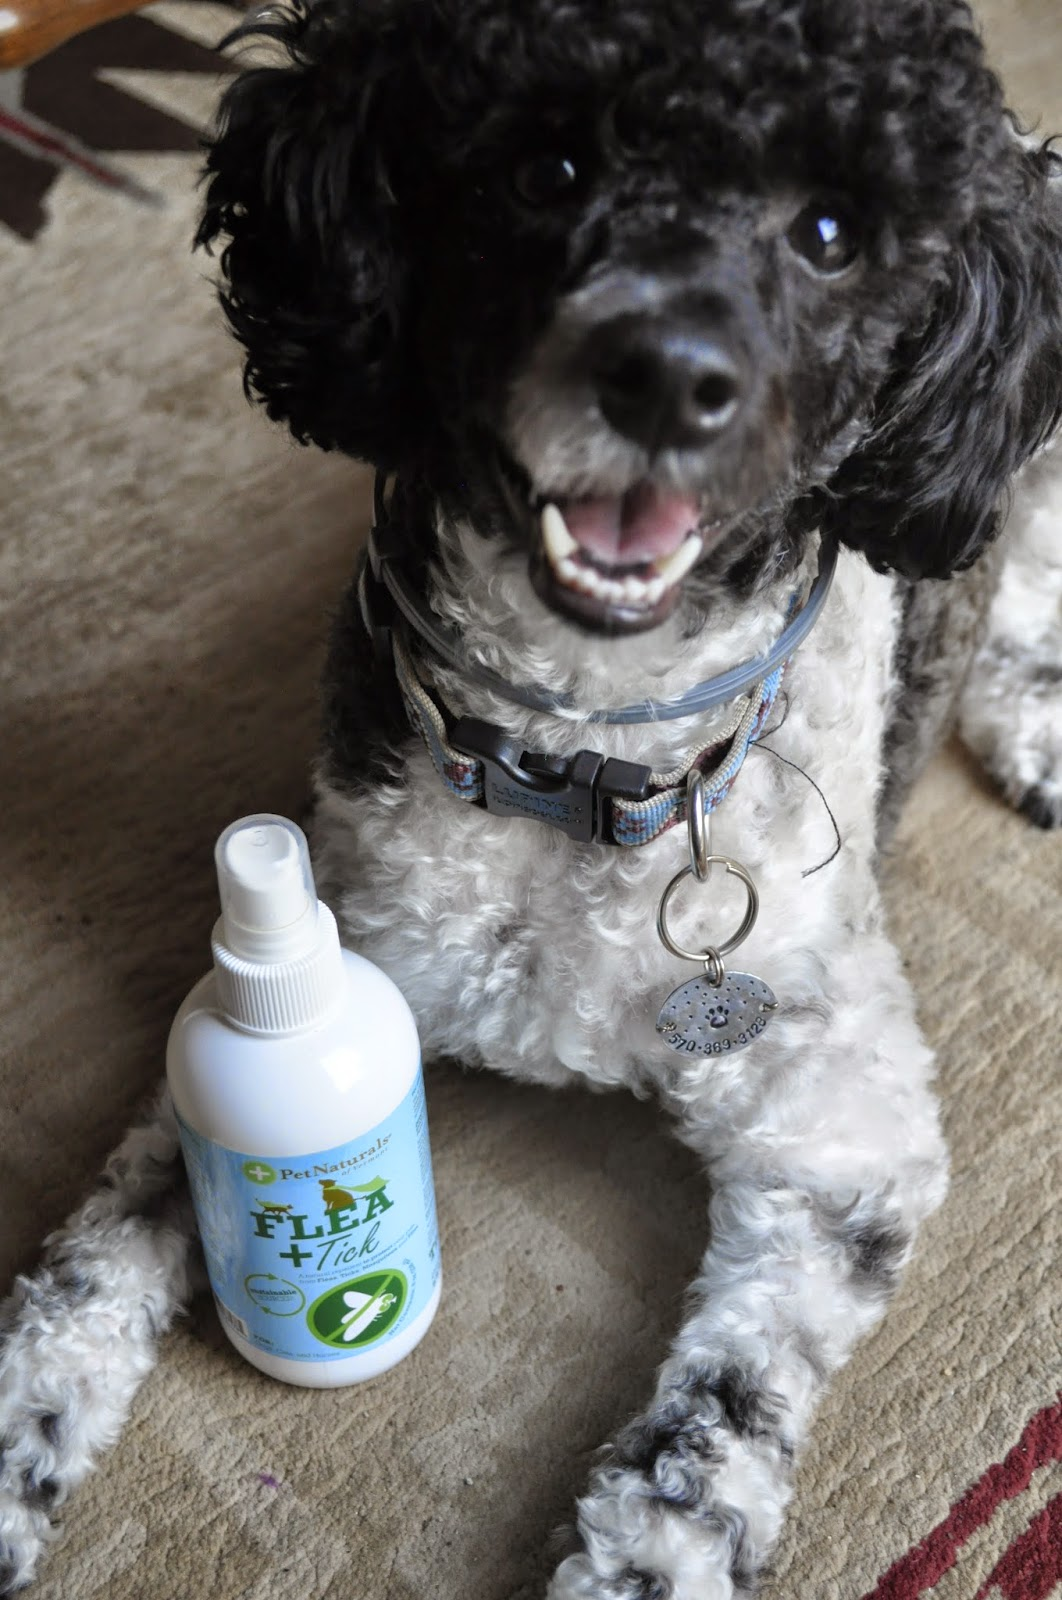 minature poodle with Pet Naturals of Vermont Flea+Tick